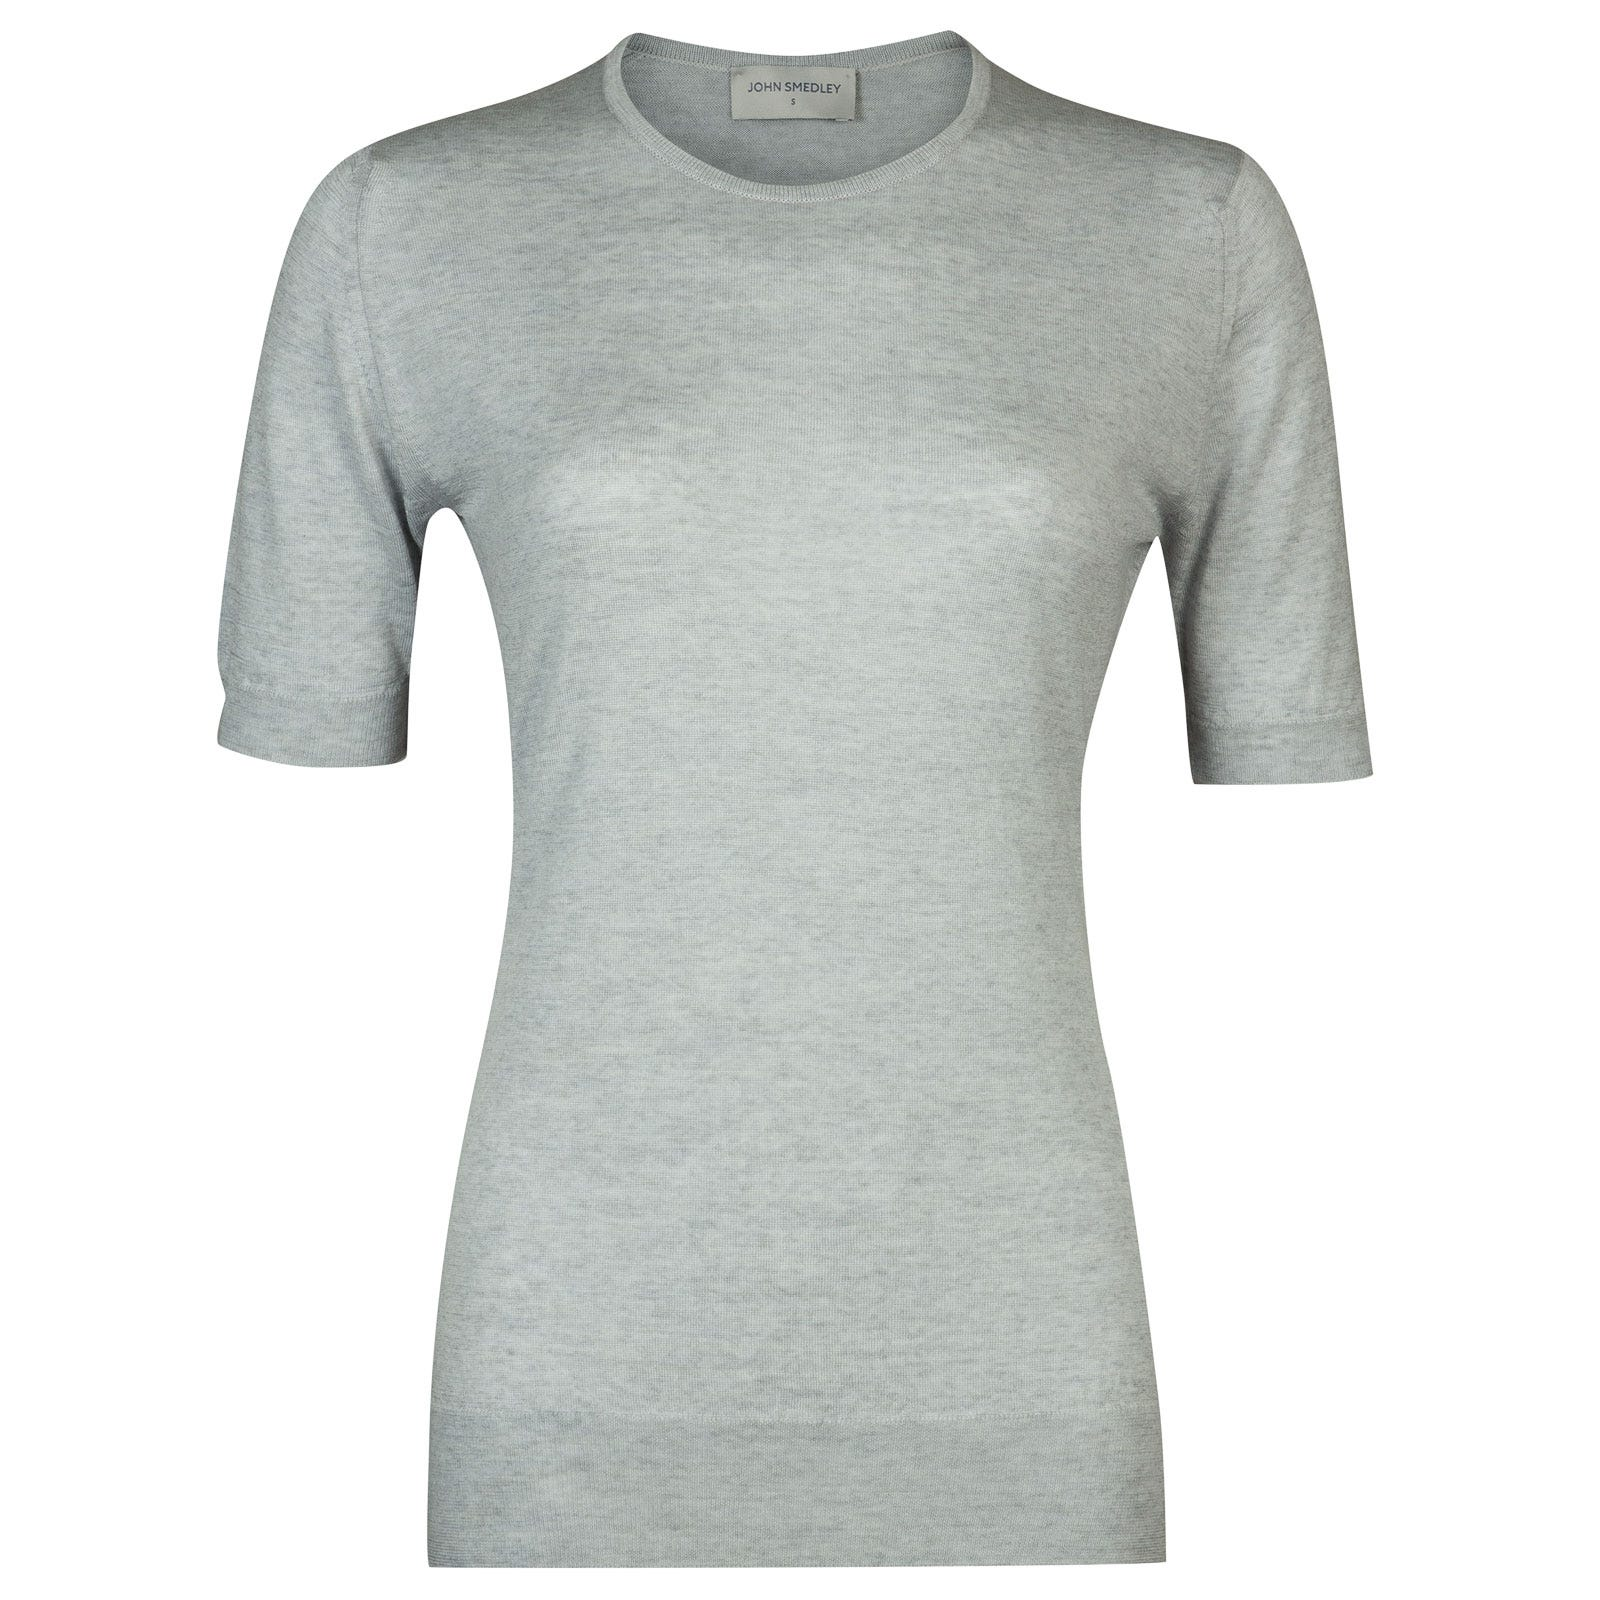 John Smedley Rietta in Bardot Grey Sweater-XLG